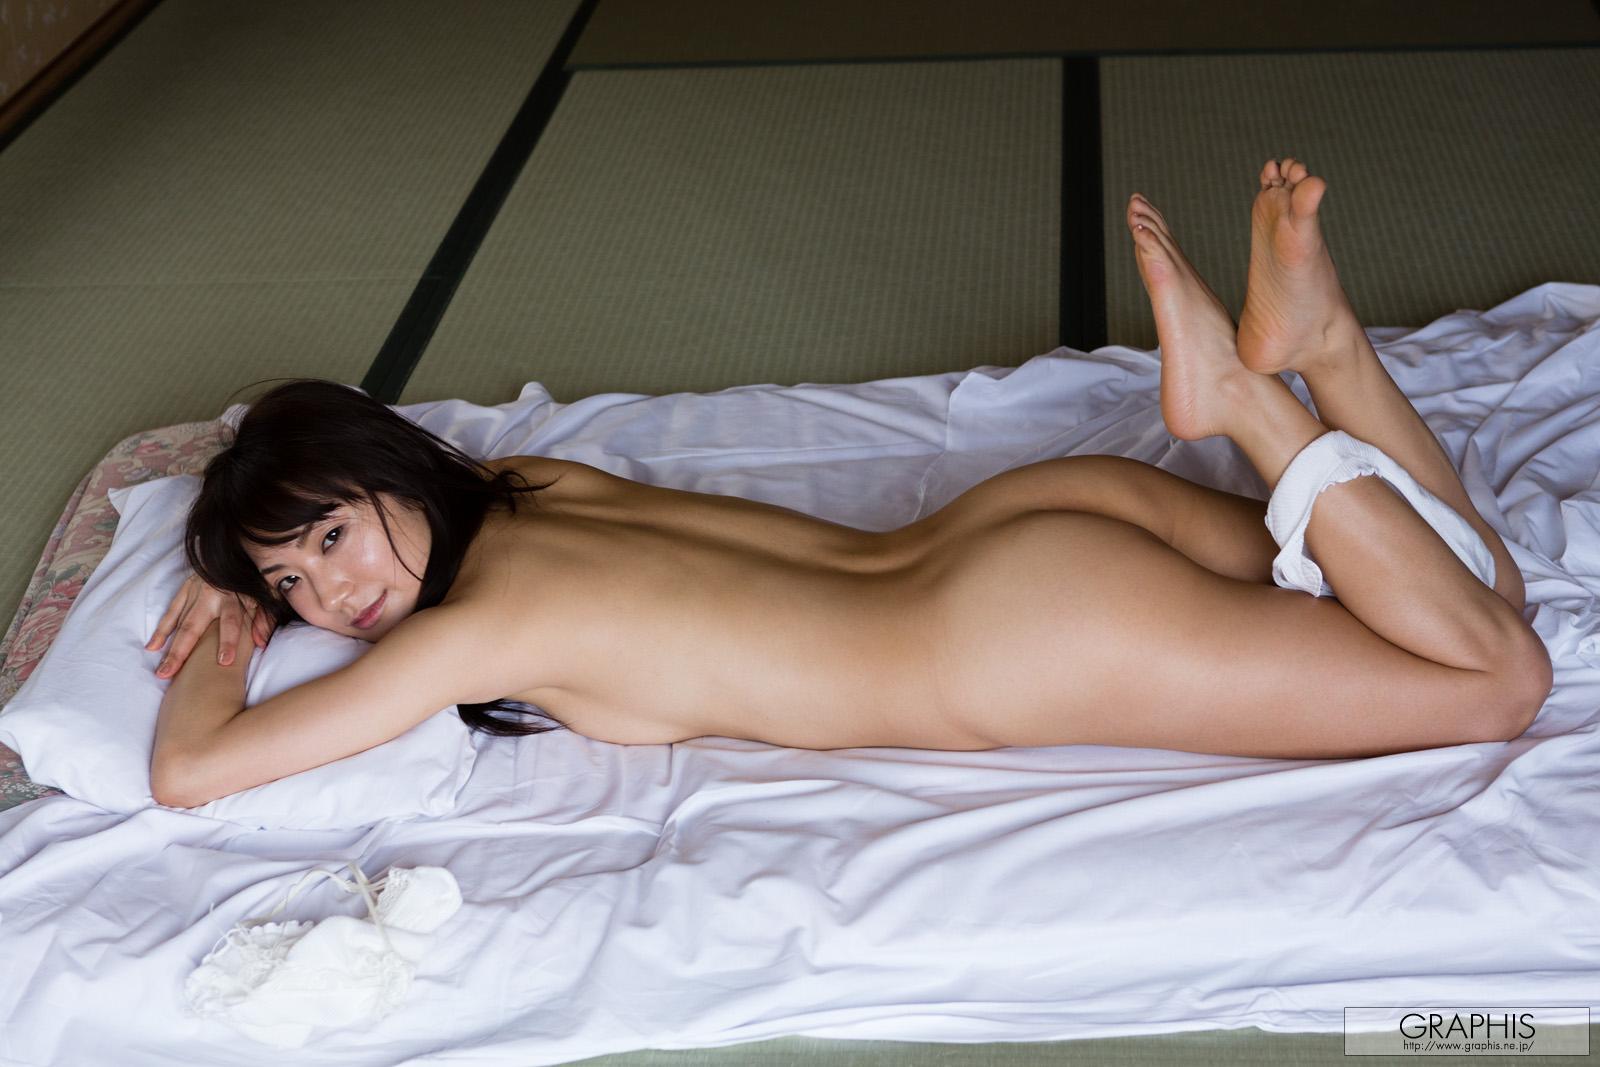 image http://scanlover.com/assets/images/272-1OpLJxtwJHGogPO5.jpeg